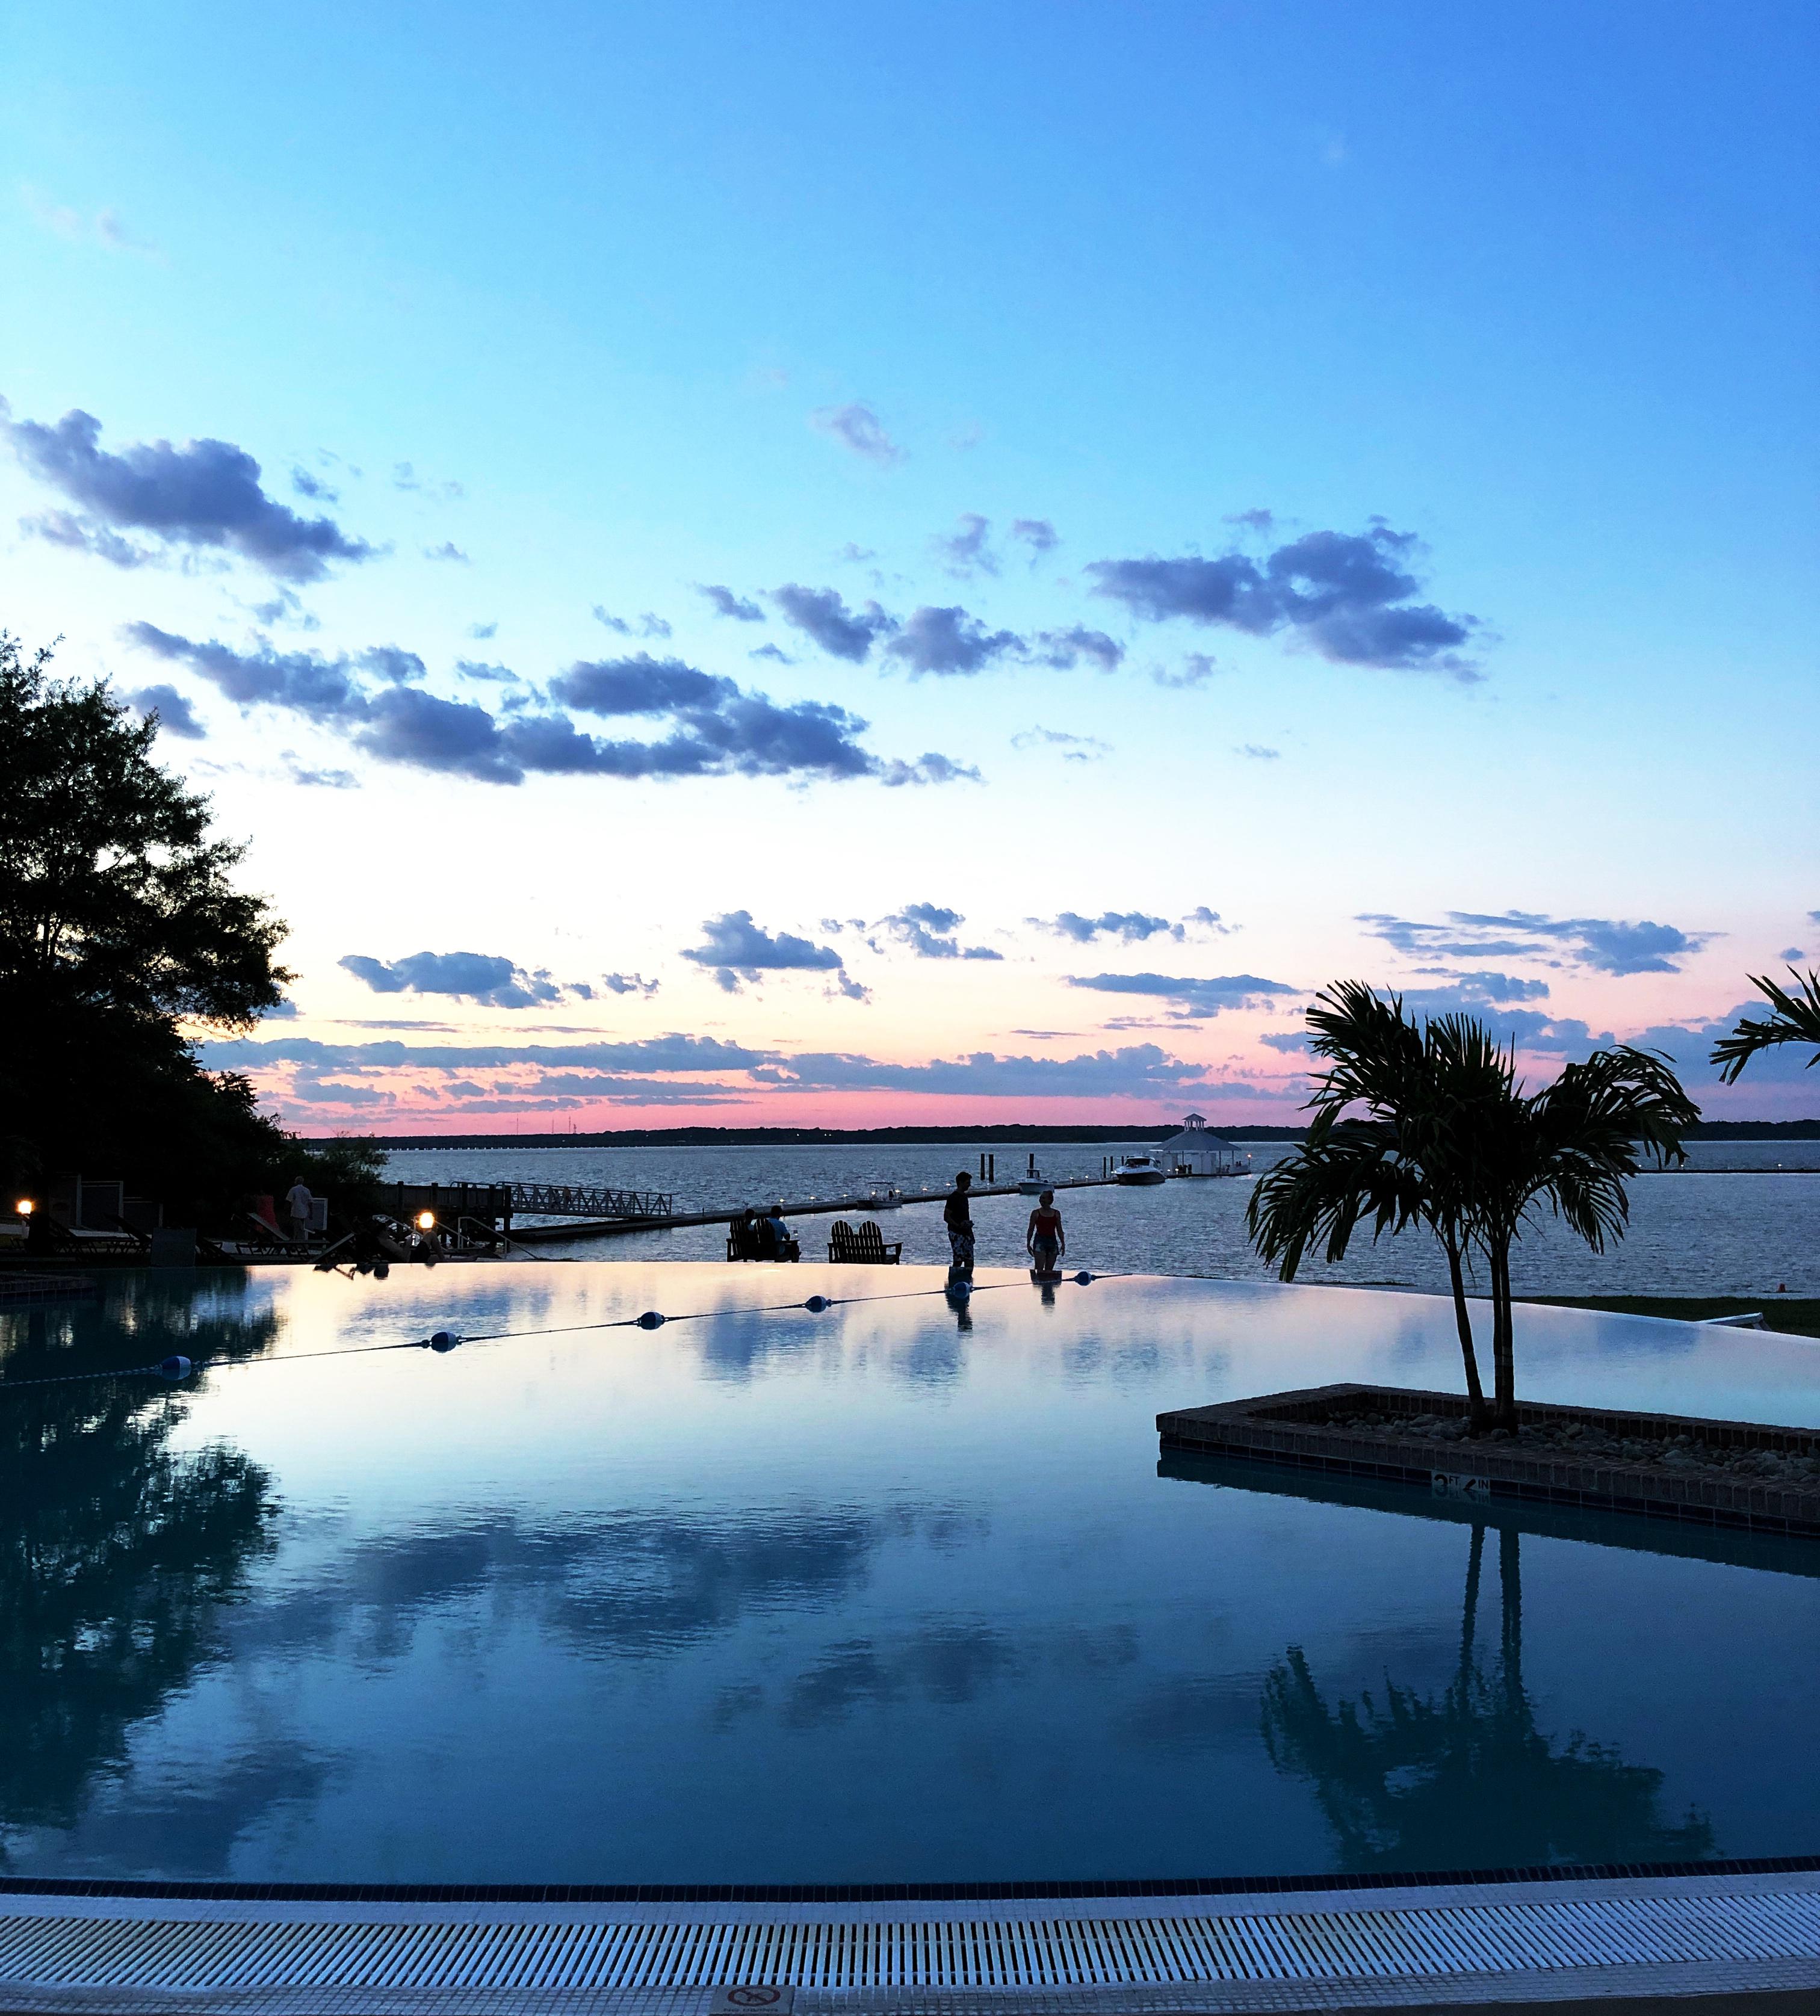 Sunset at the infinity pool at the Hyatt Regency Chesapeake Bay